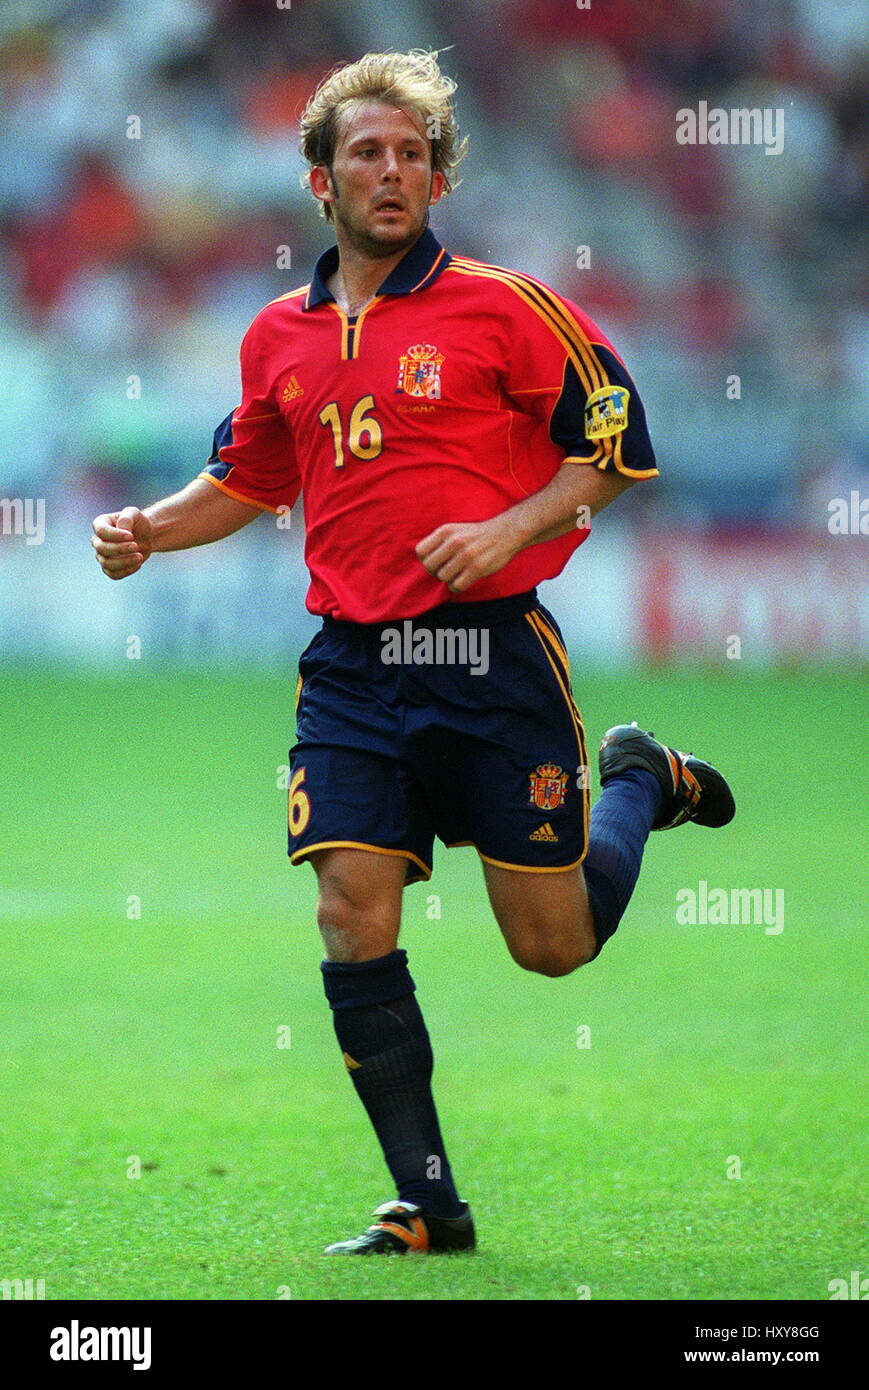 GAIZKA MENDIETA SPAIN CHARLEROI EURO 2000 20 June 2000 Stock